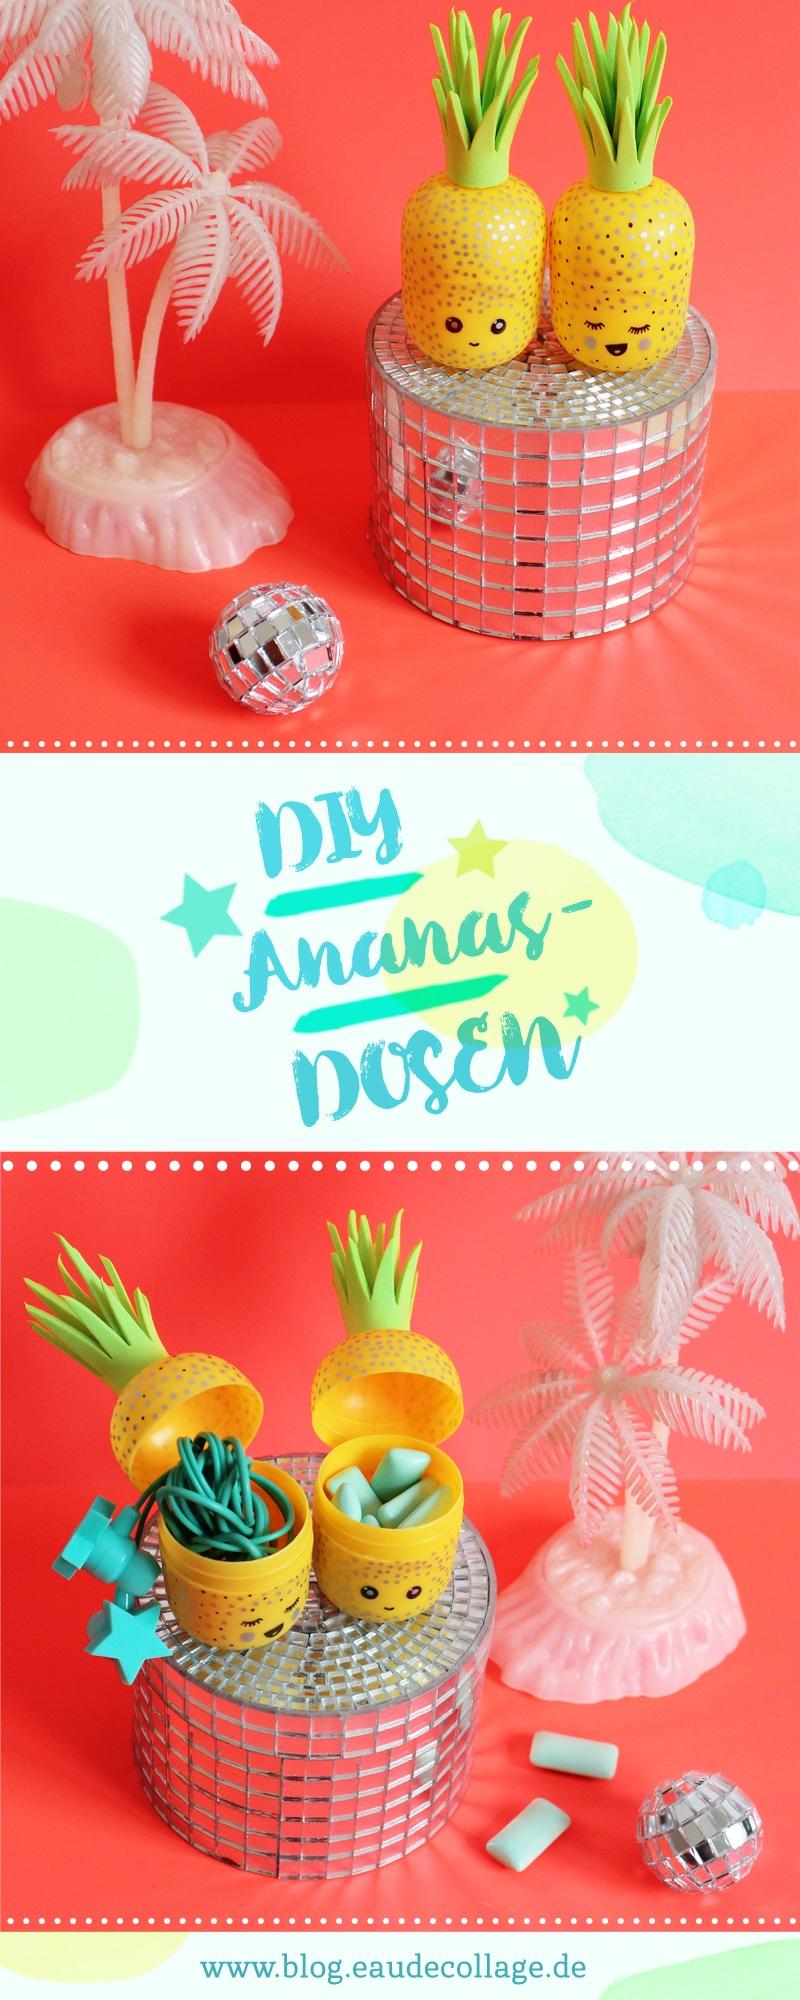 diy ananas kopfh rer aufbewahrung handmade kultur. Black Bedroom Furniture Sets. Home Design Ideas